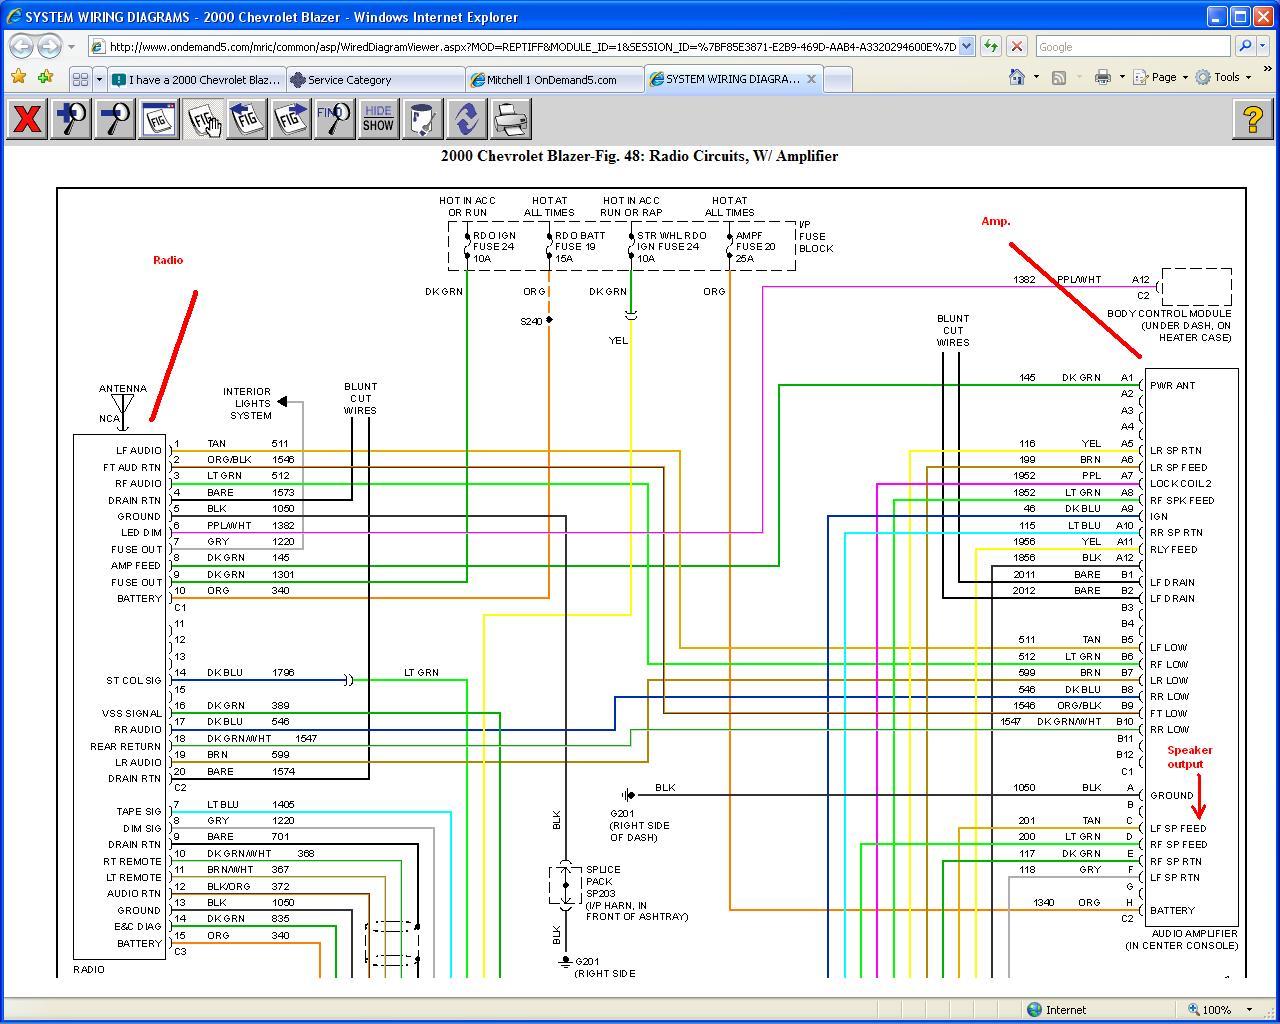 1998 Chevy Blazer Radio Wiring Diagrams - 07 Nissan Sentra Wiring Diagram -  corollaa.tukune.jeanjaures37.fr   1998 Chevy Blazer Radio Wiring Diagrams      Wiring Diagram Resource